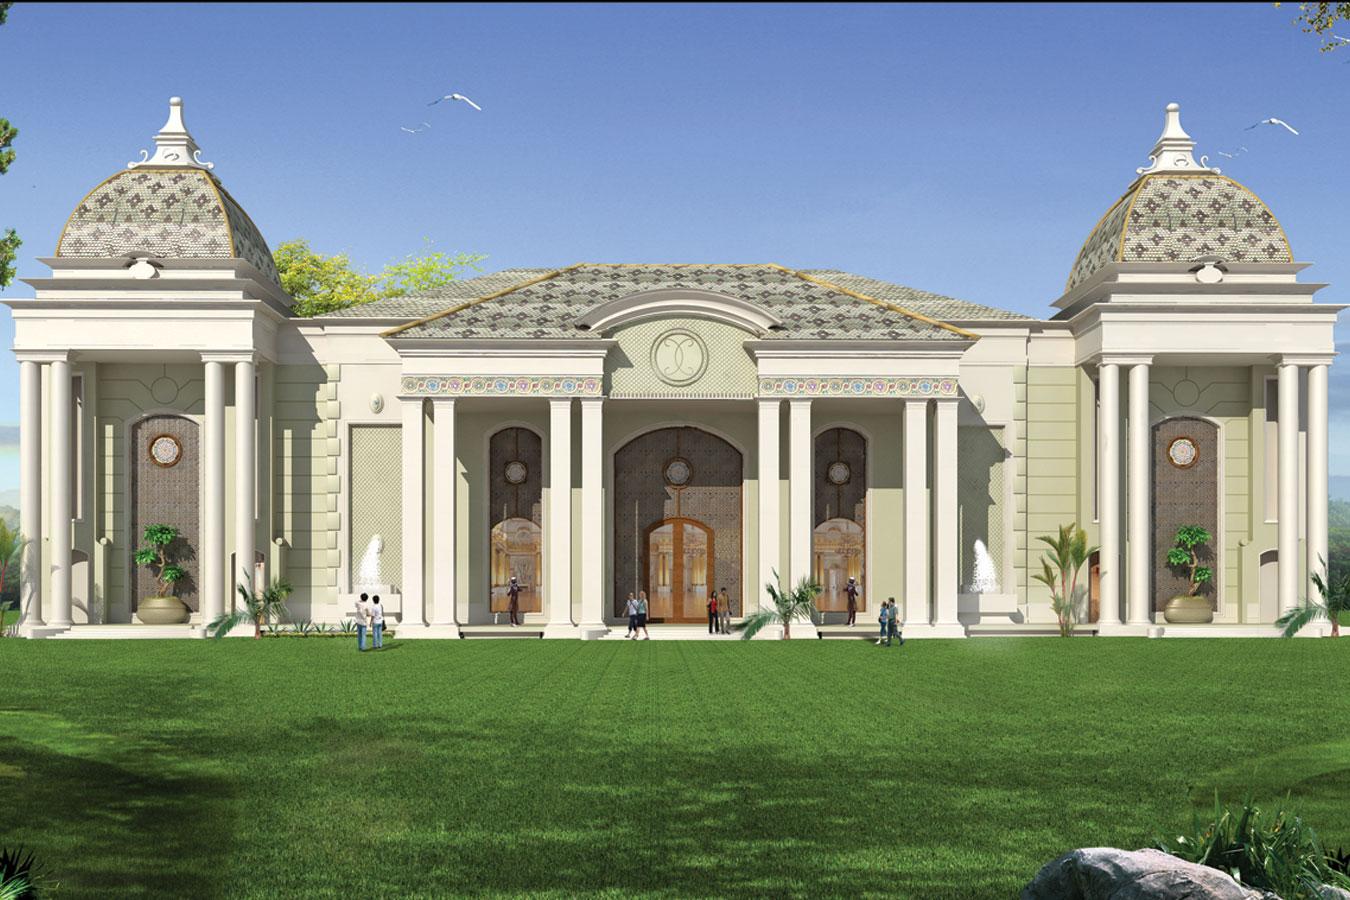 PunjabKesari, Nari, Kapil Sharma Wedding Venue, Cabbana Resort Image